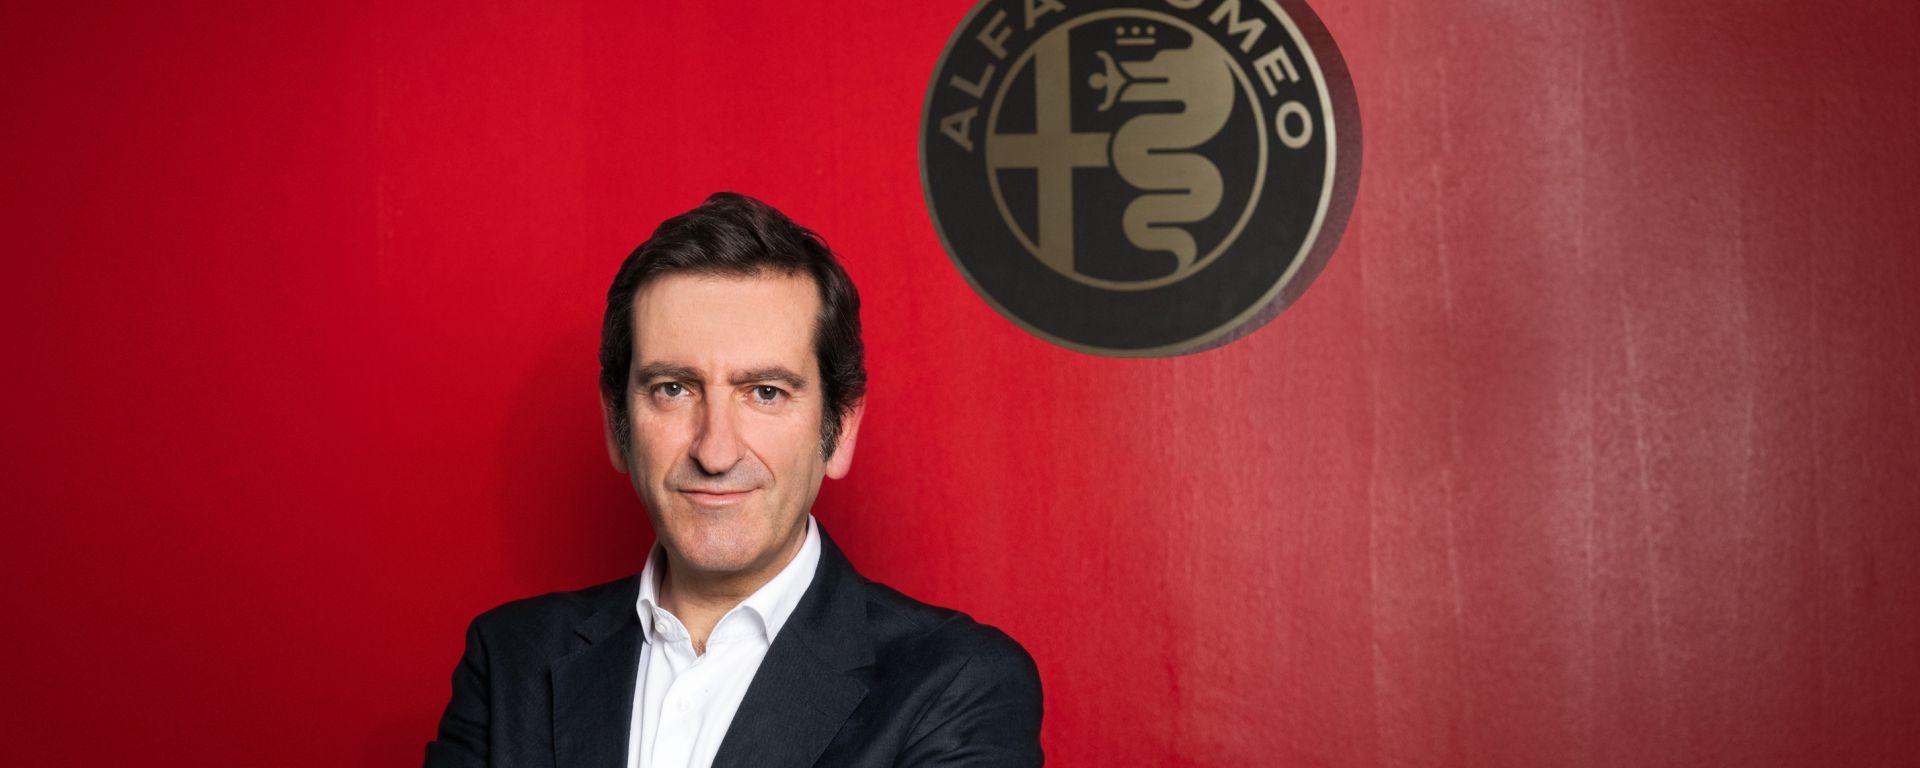 Alejandro Mesonero-Romanos, nuovo Head of Alfa Romeo Design